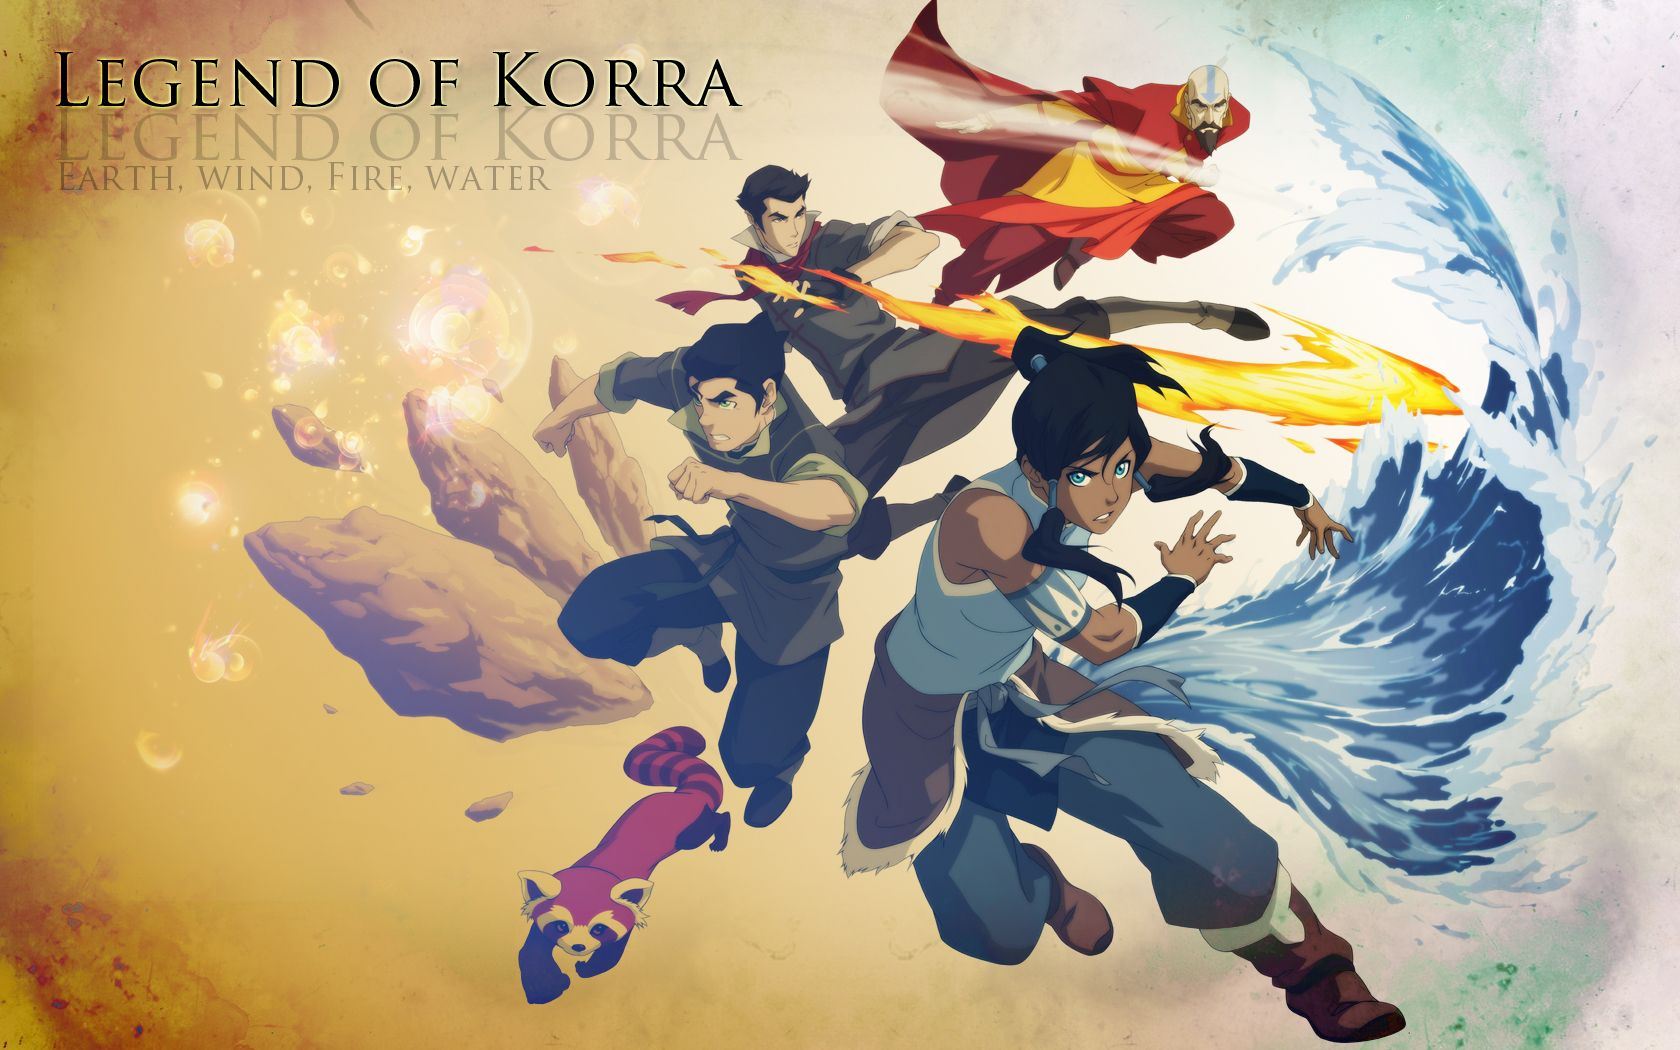 The Legend of Korra wallpaper | Legend of korra, Korra ...